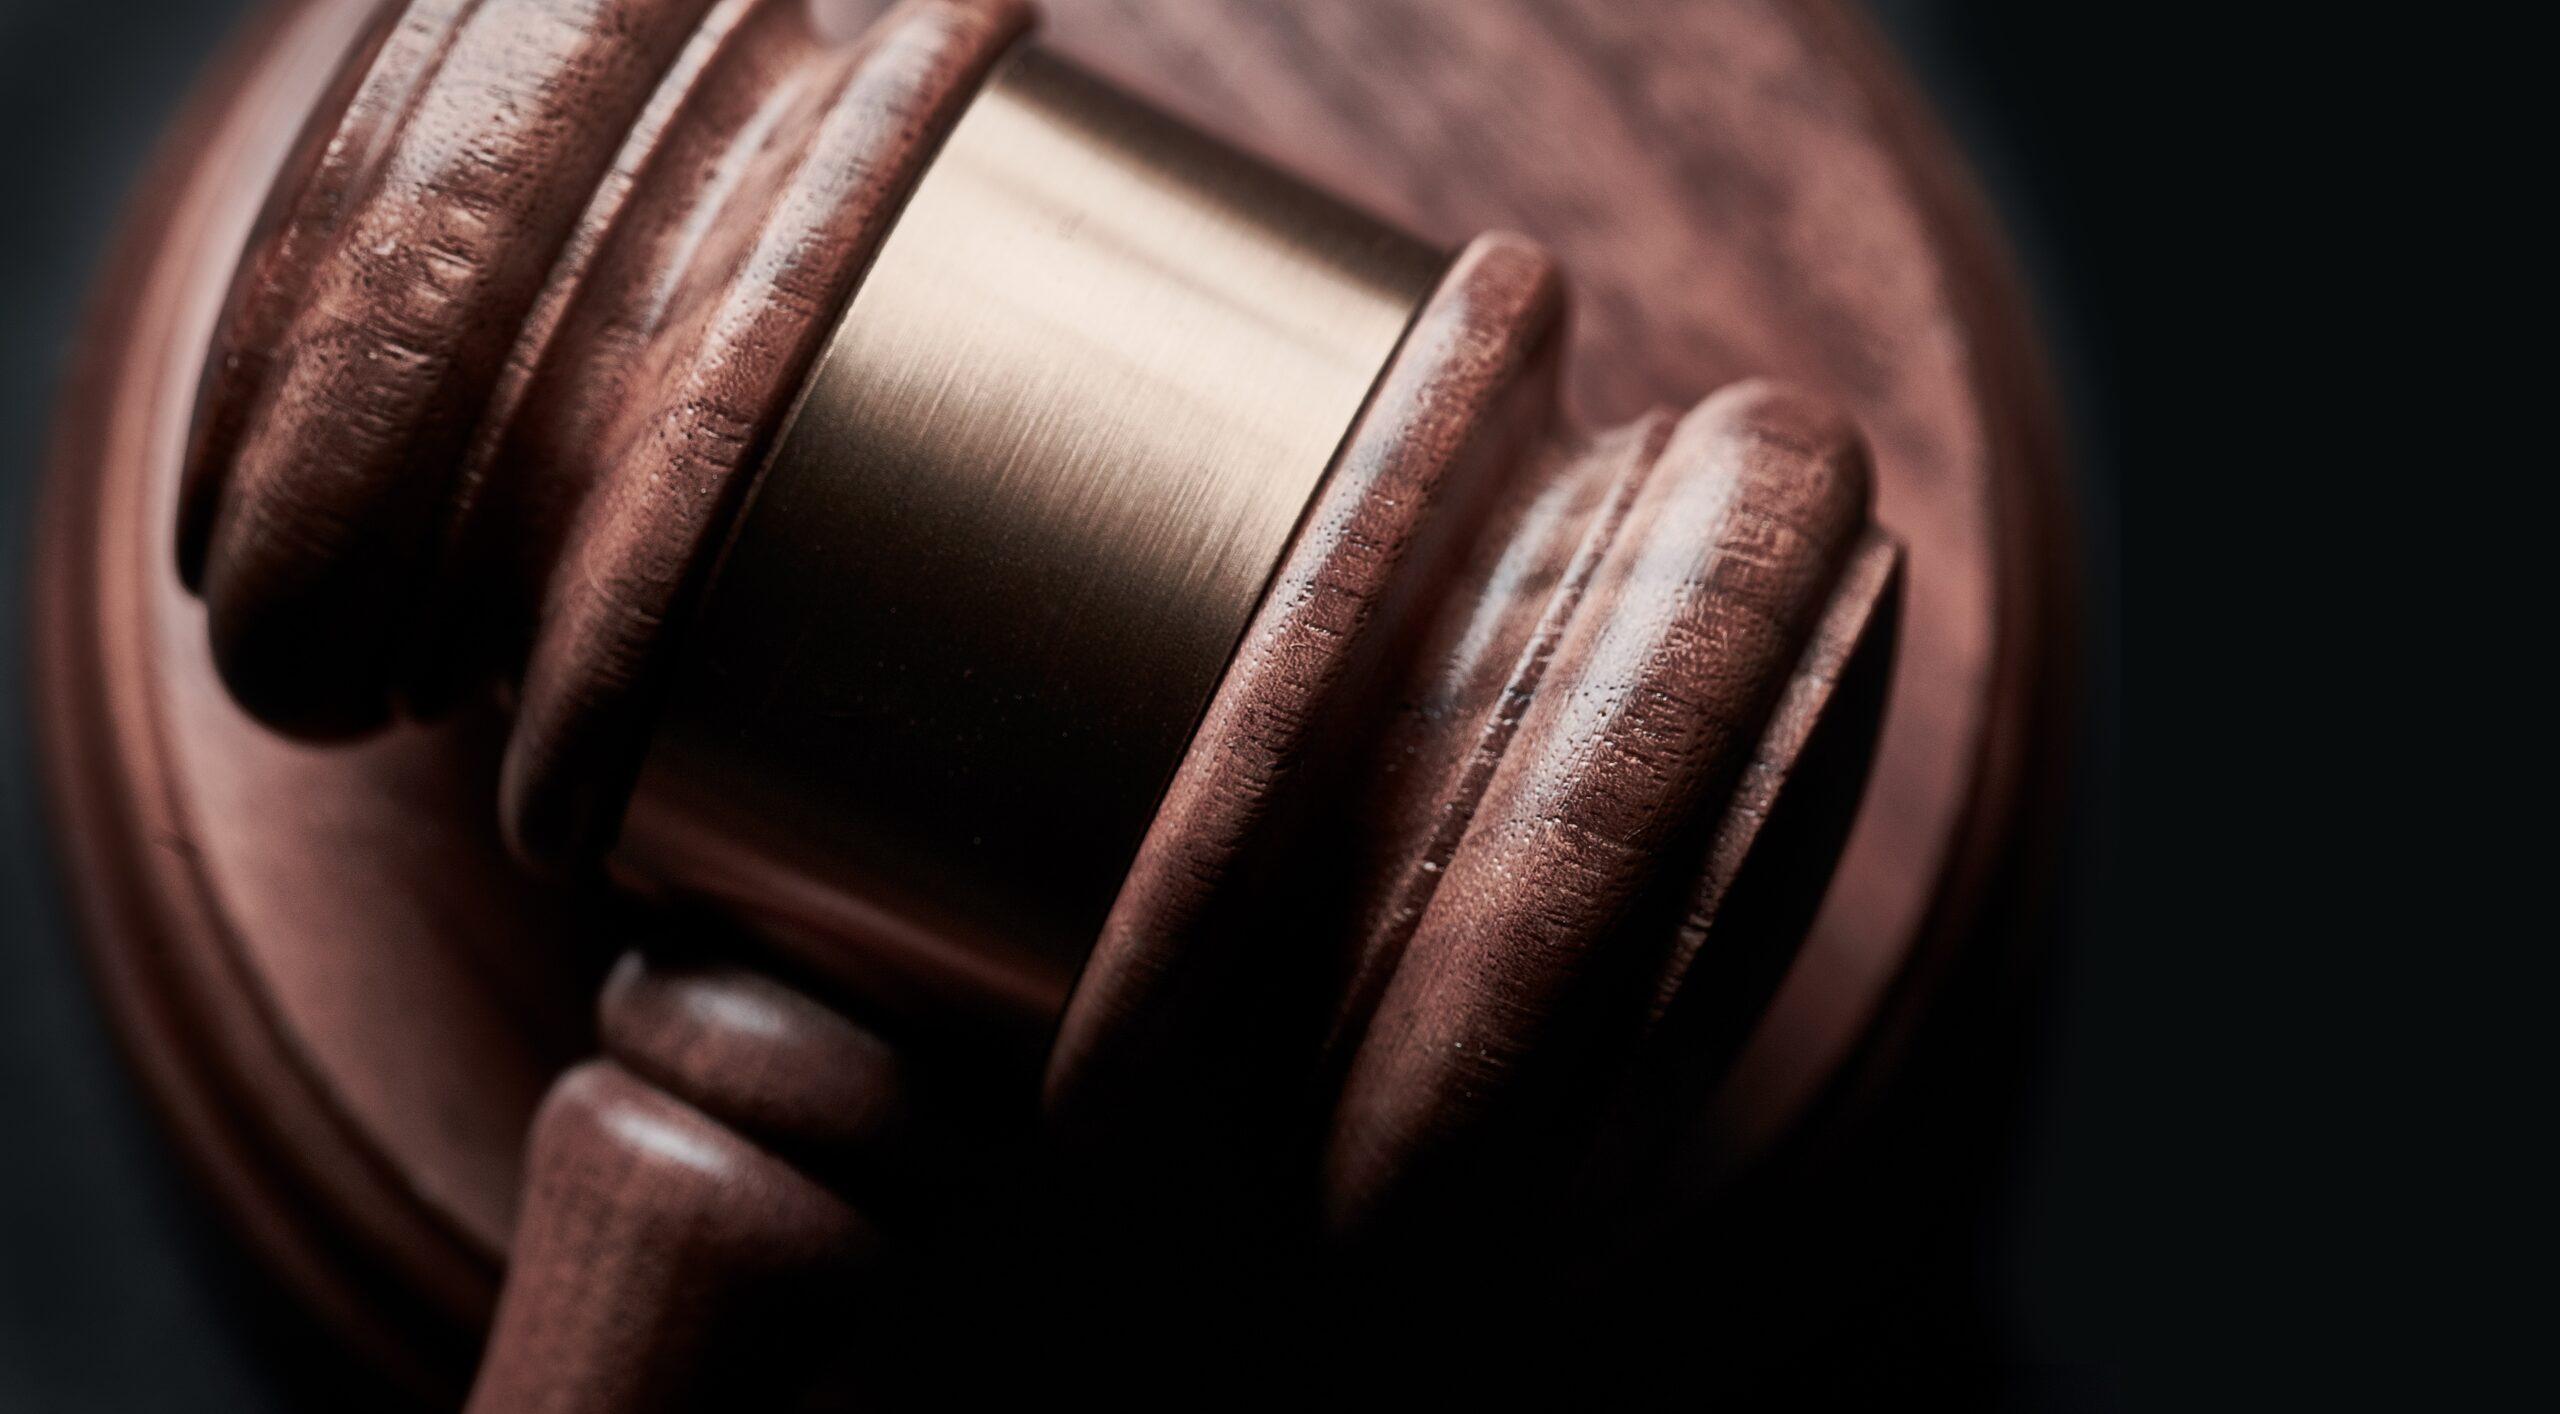 Antitrust laws